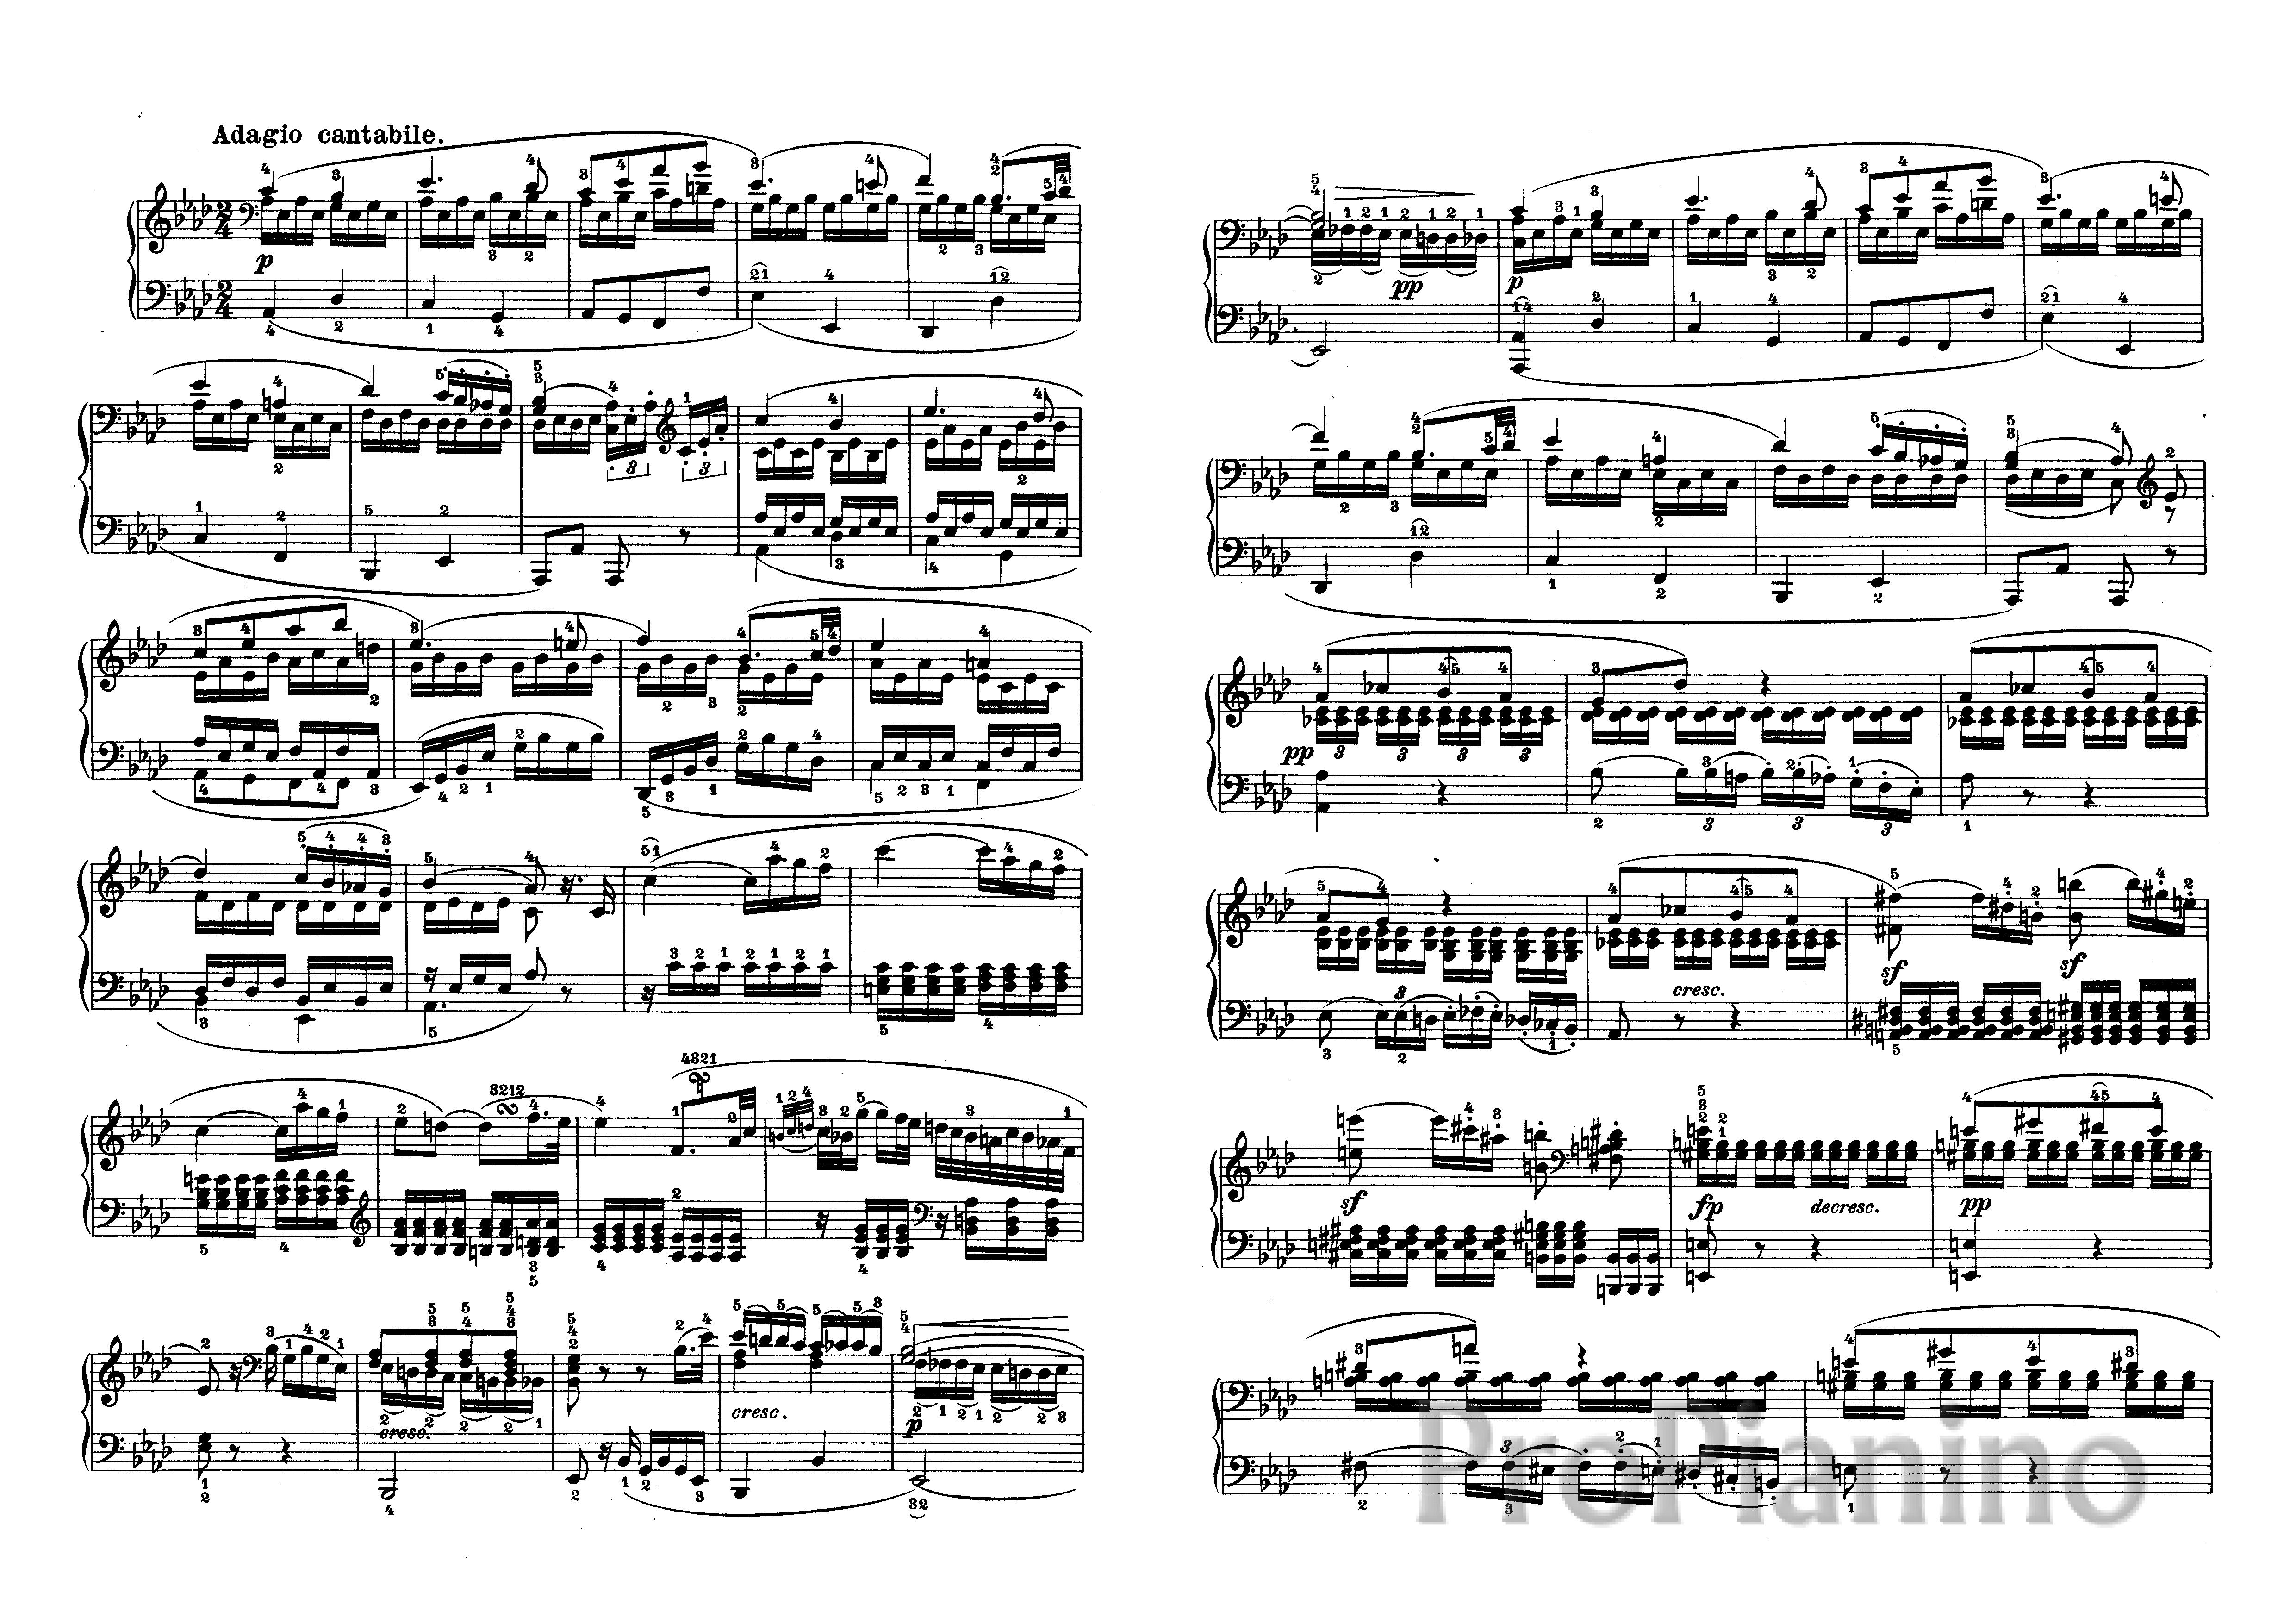 Бетховен 5 симфония скачать mp3